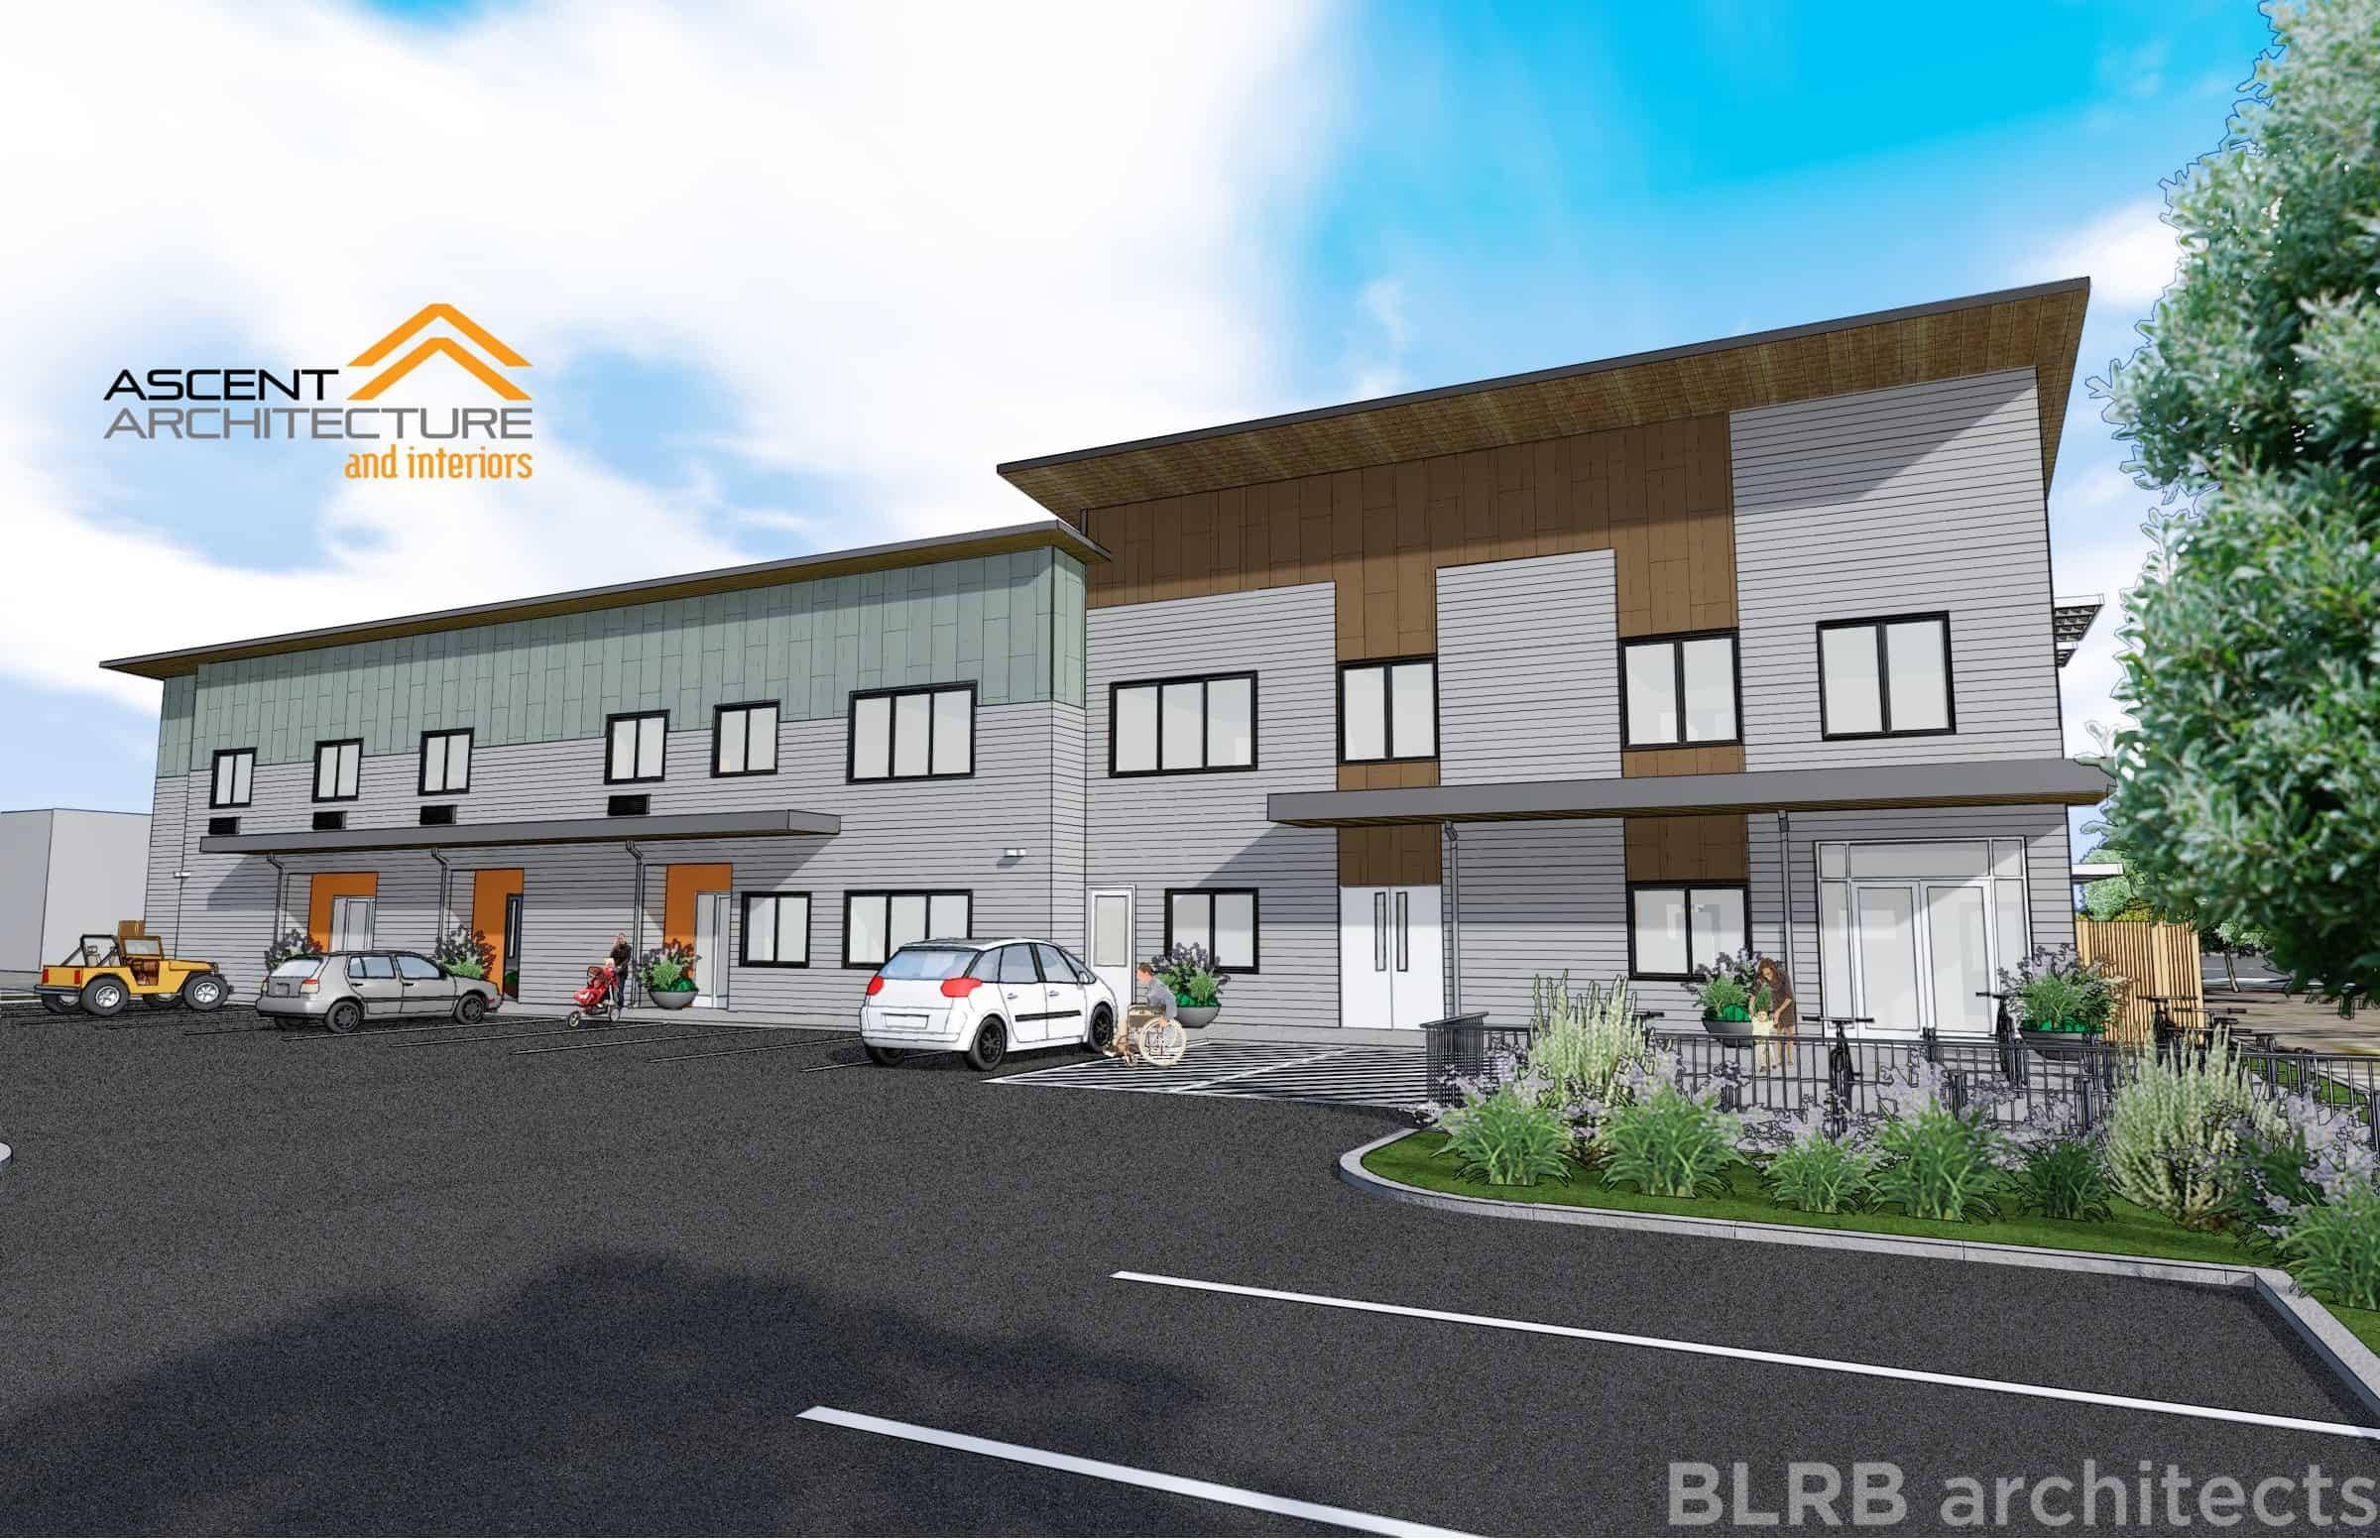 bethlehem inn homeless shelter ascent architecture. Black Bedroom Furniture Sets. Home Design Ideas